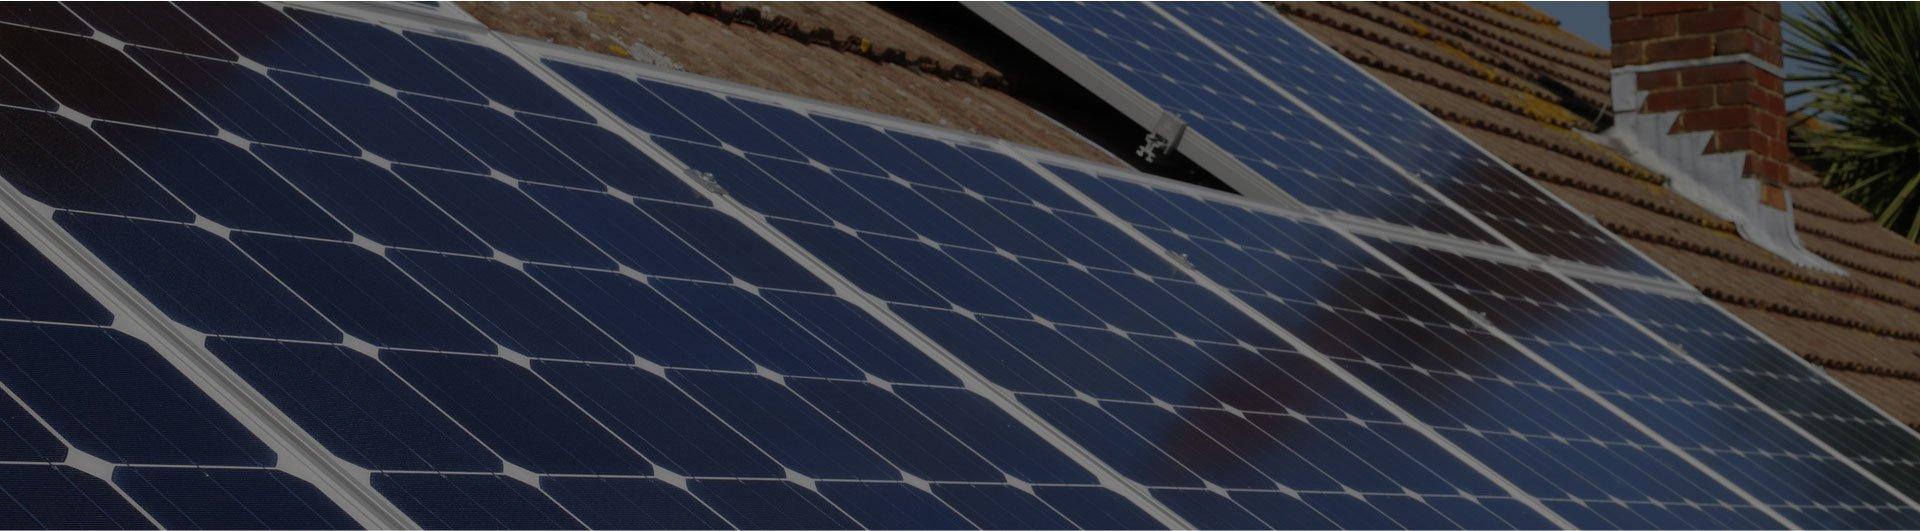 solar fitting